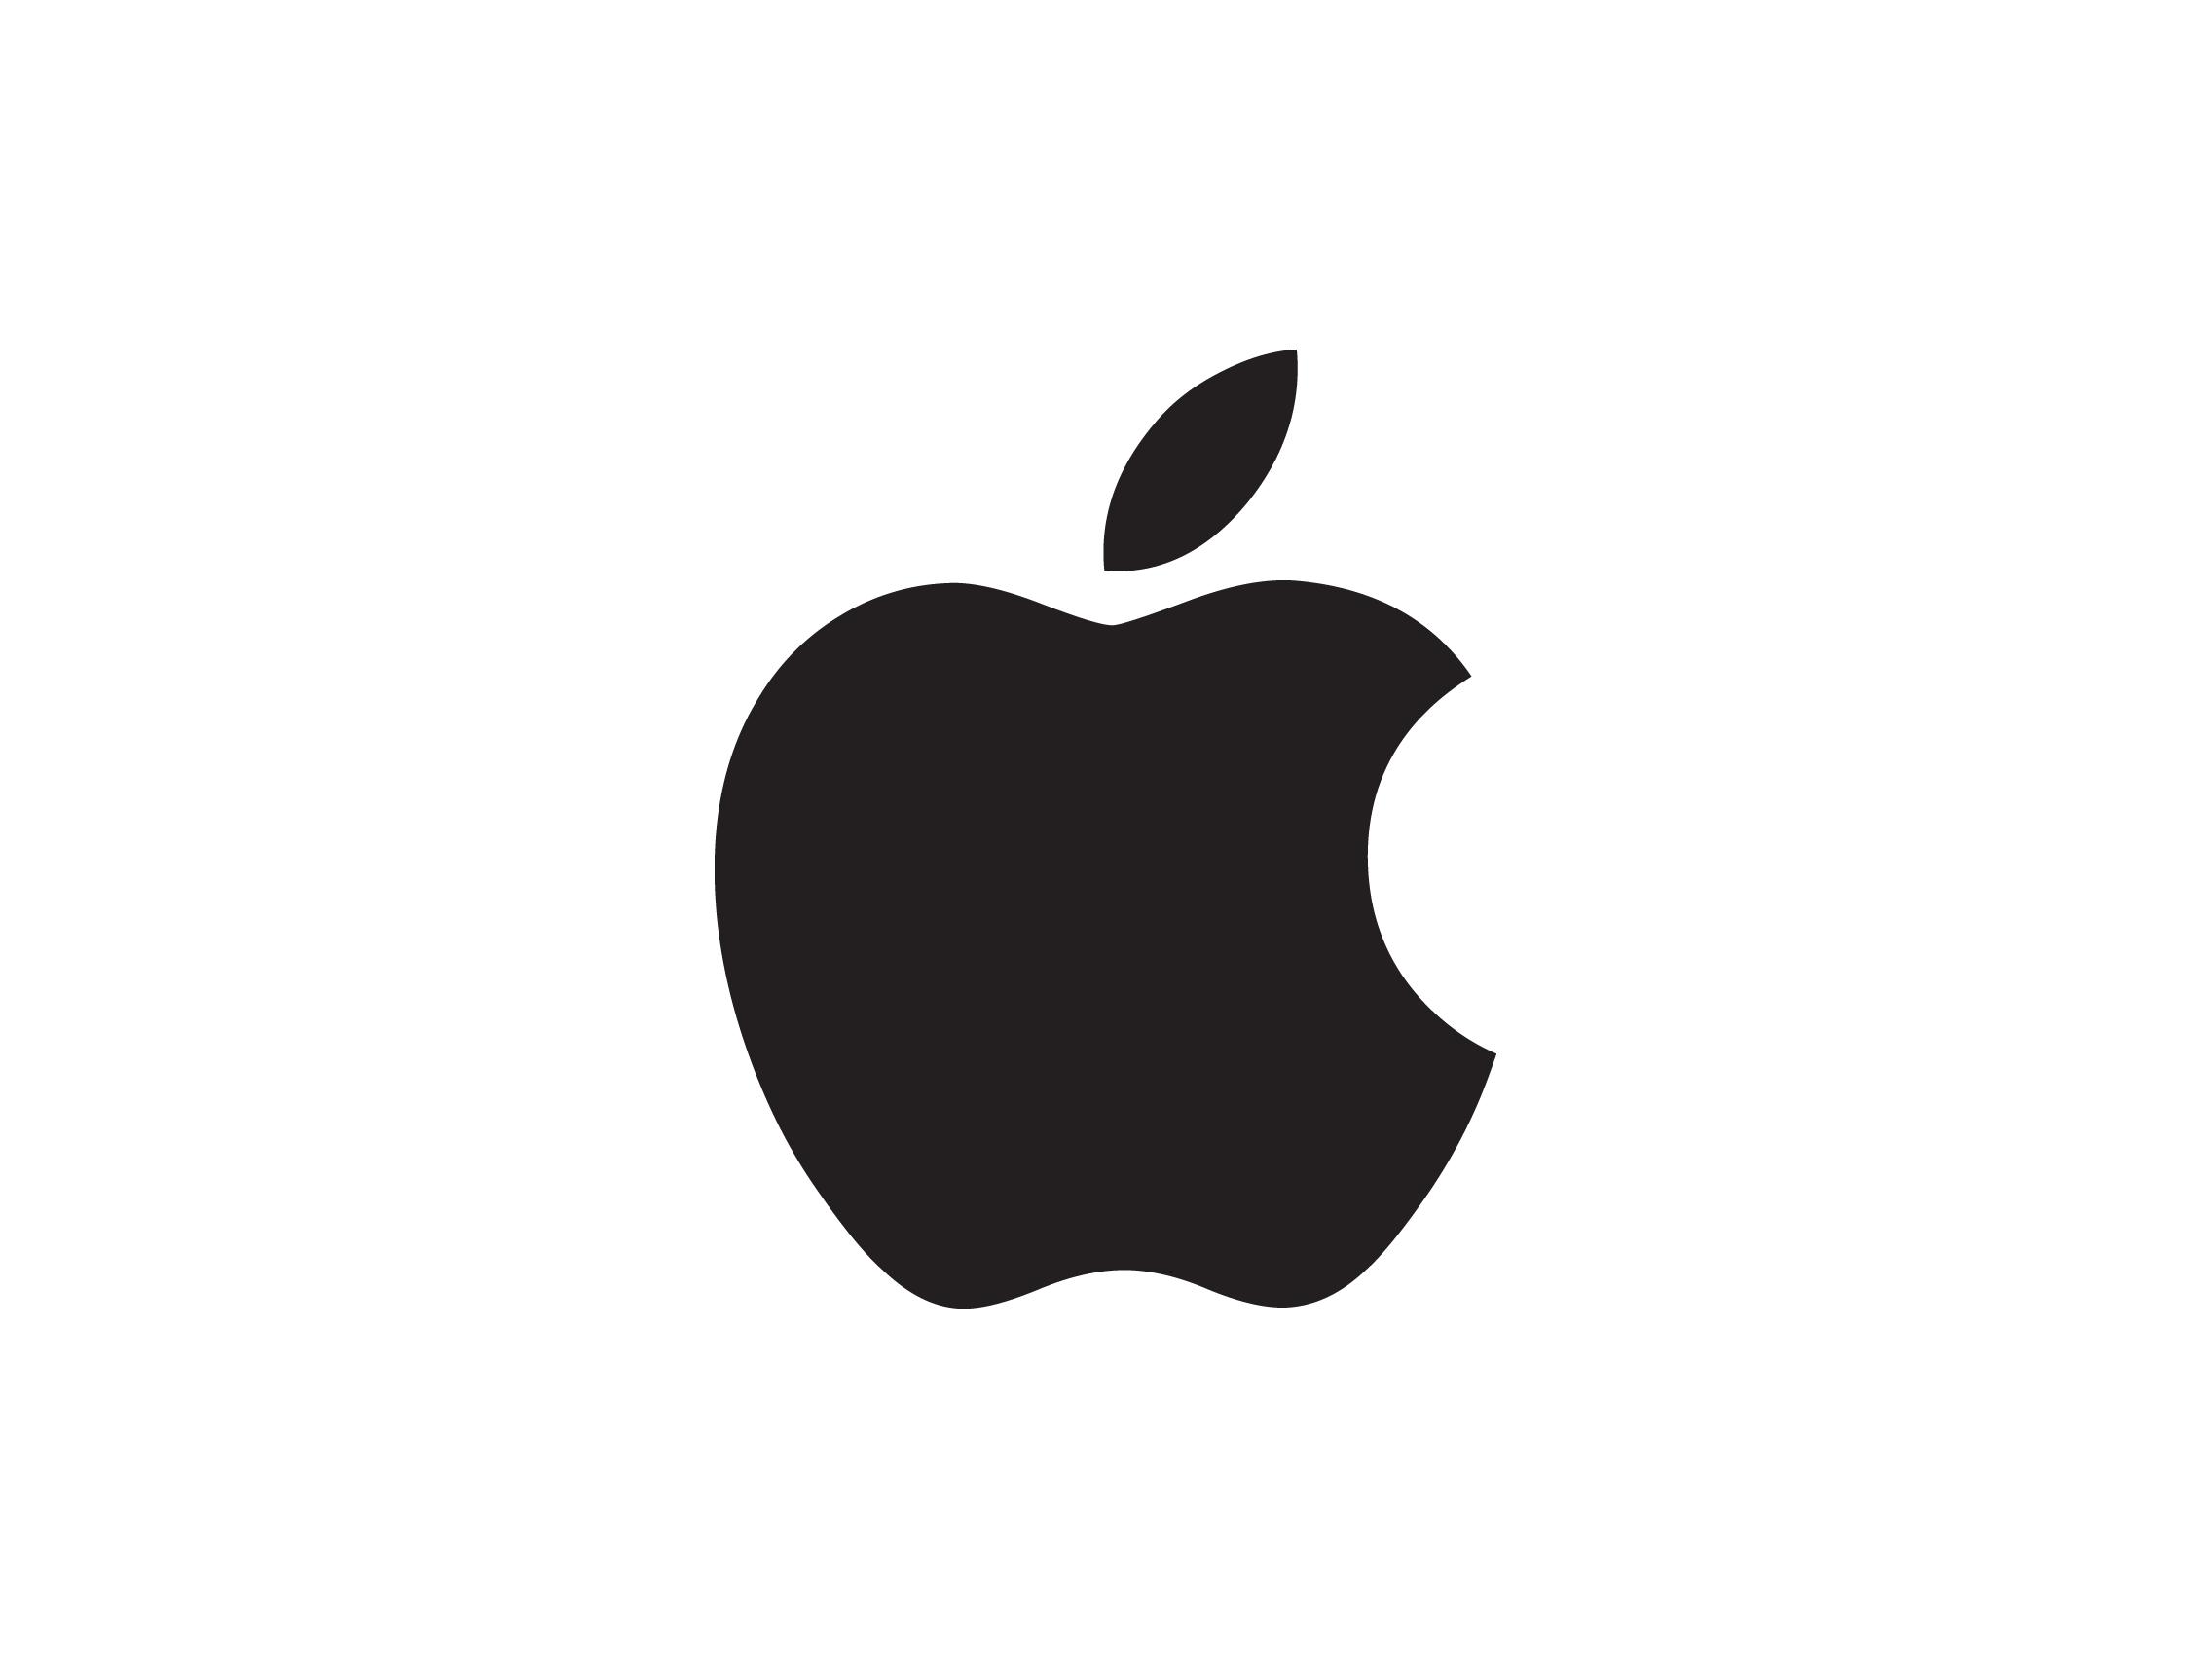 Apple®